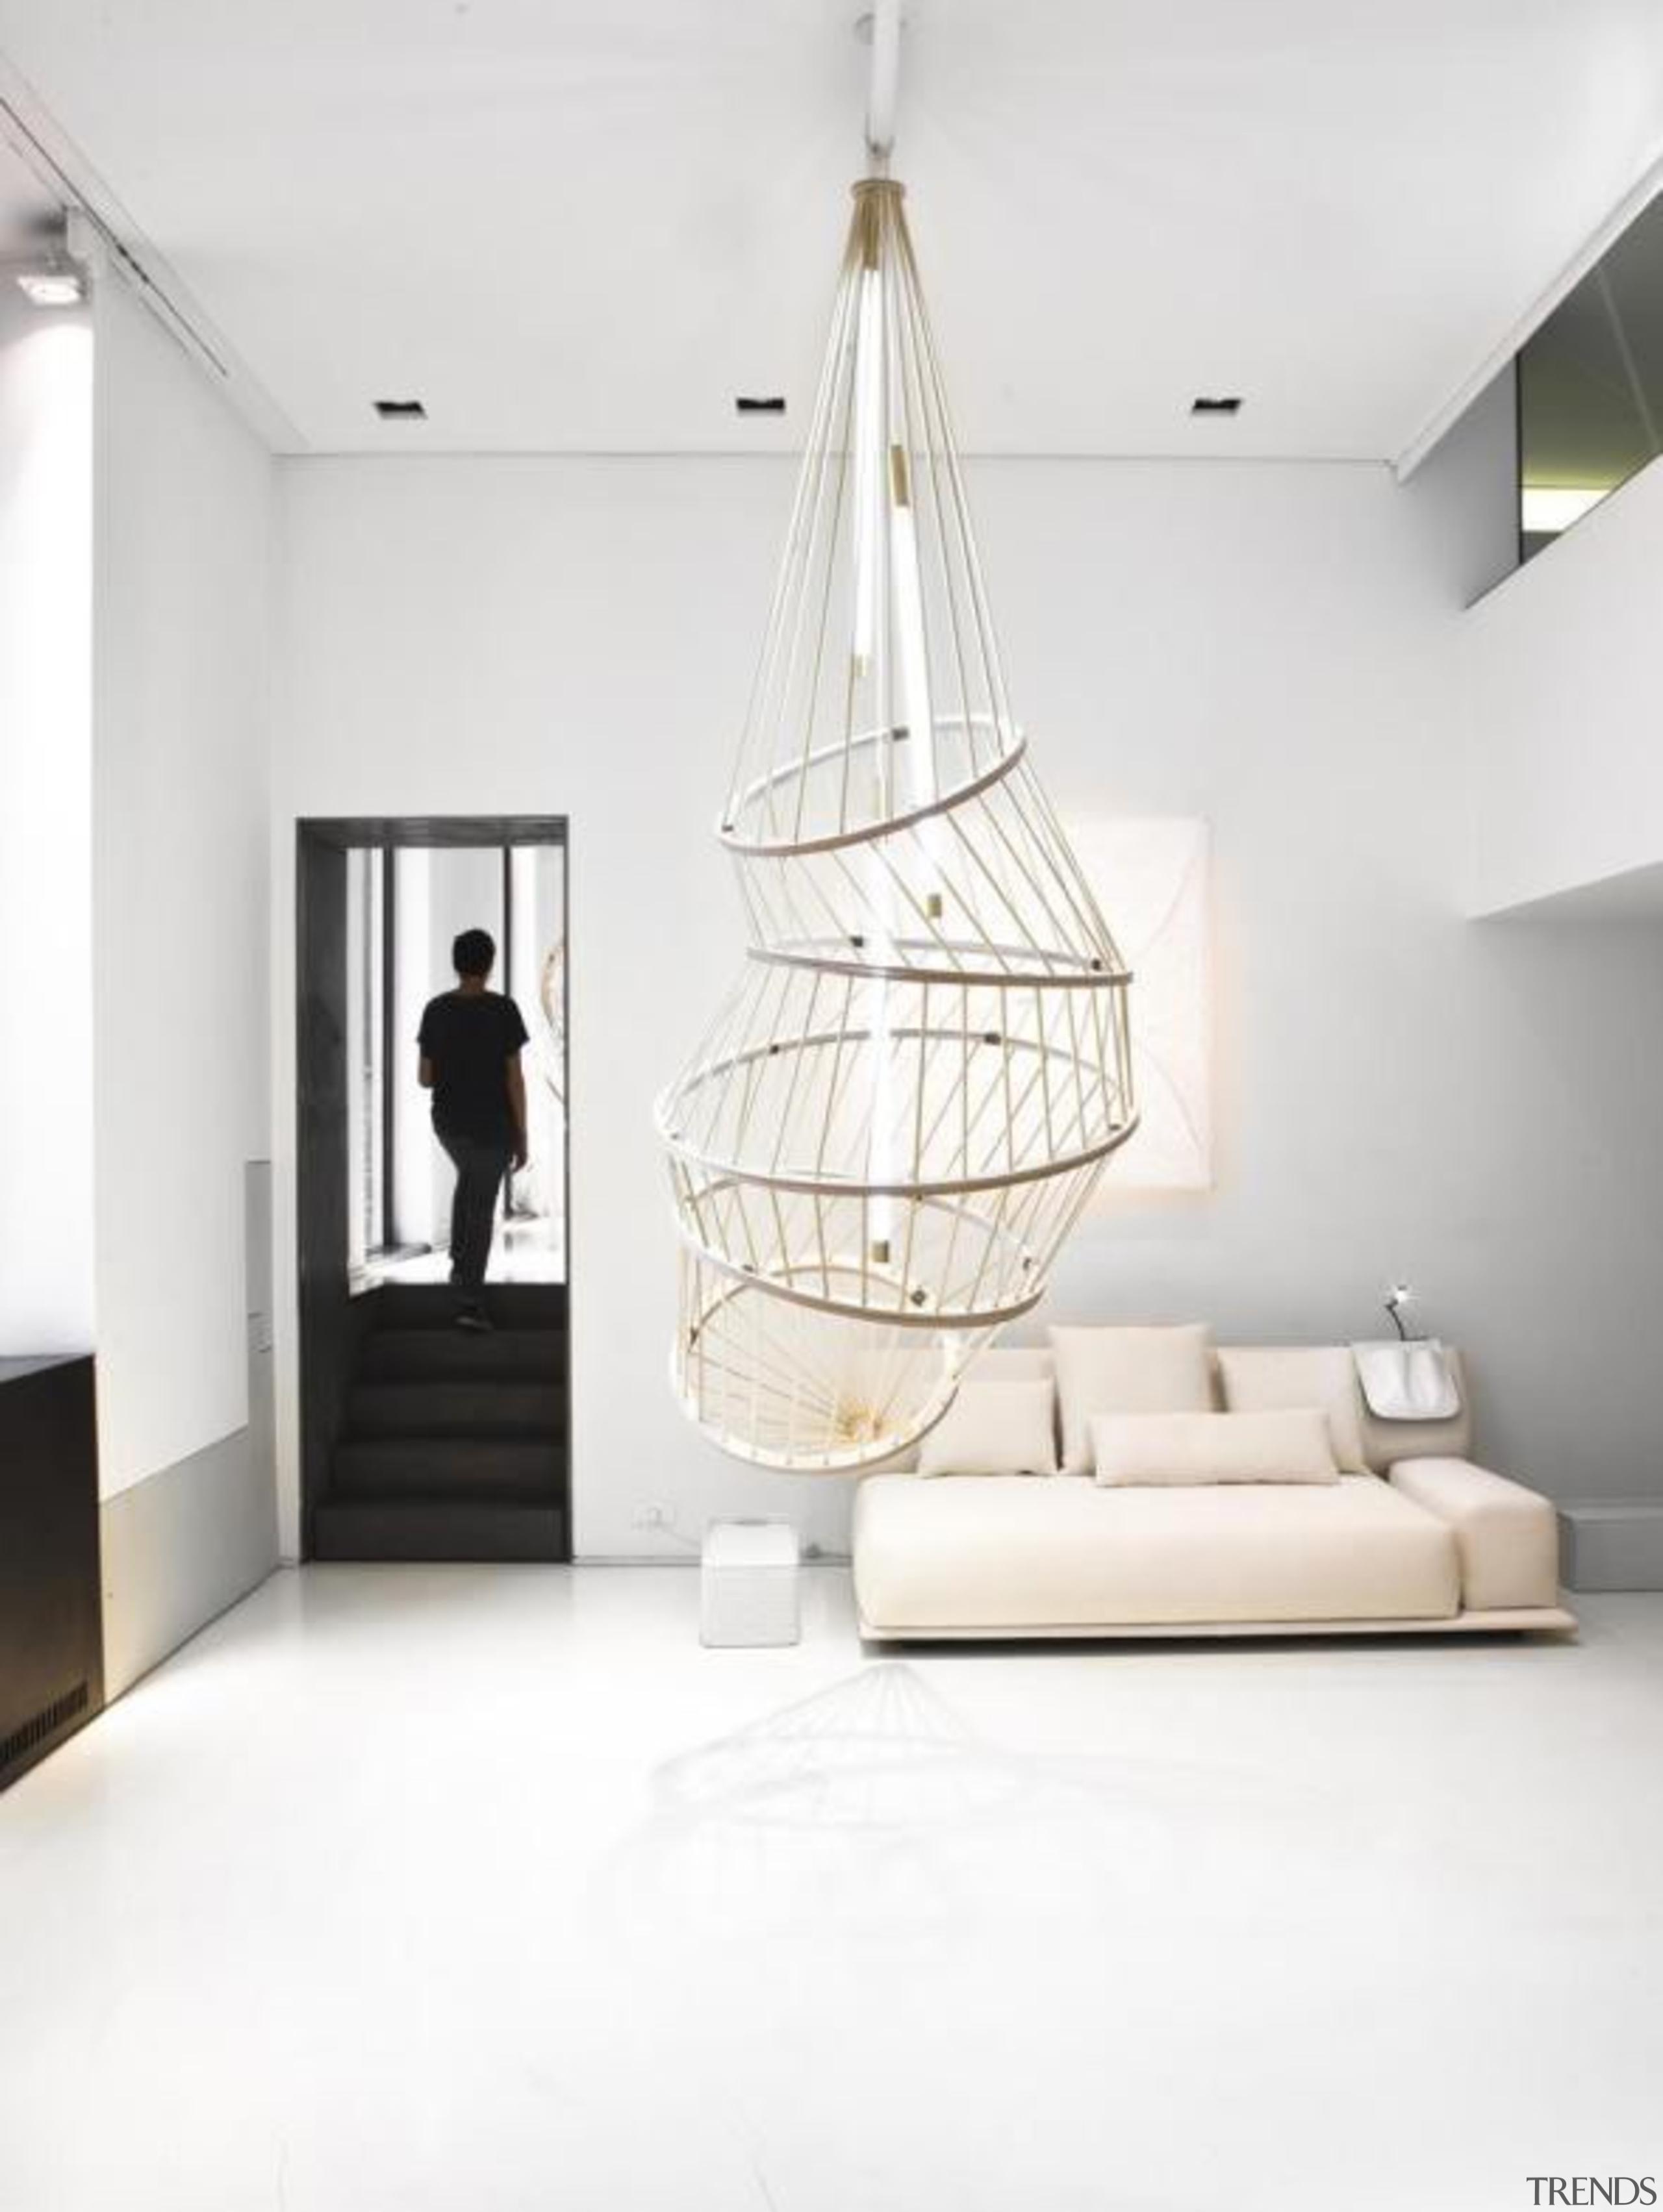 Constance Guisset for Molteni & C: MO Lamp ceiling, floor, home, interior design, light fixture, product design, white